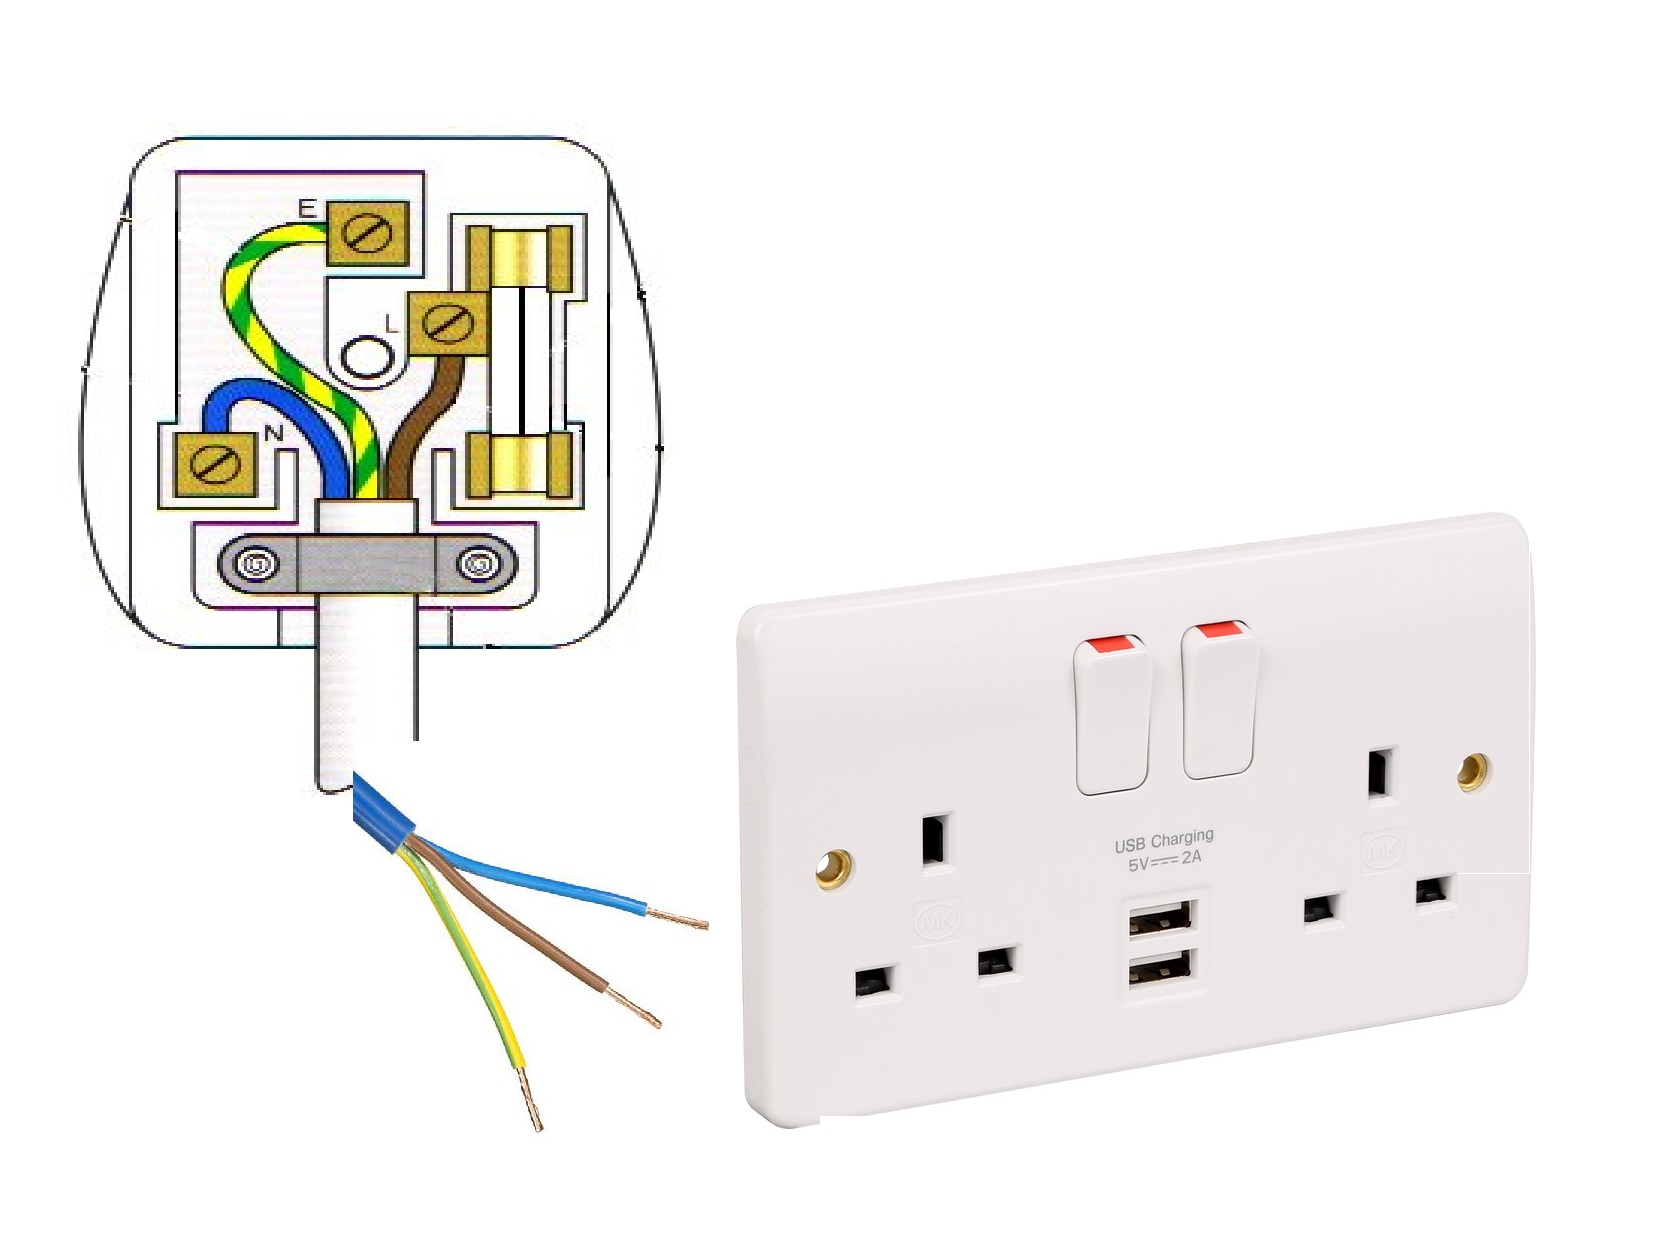 electric socket wiring diagram - wiring diagrams  wood.need.lesvignoblesguimberteau.fr